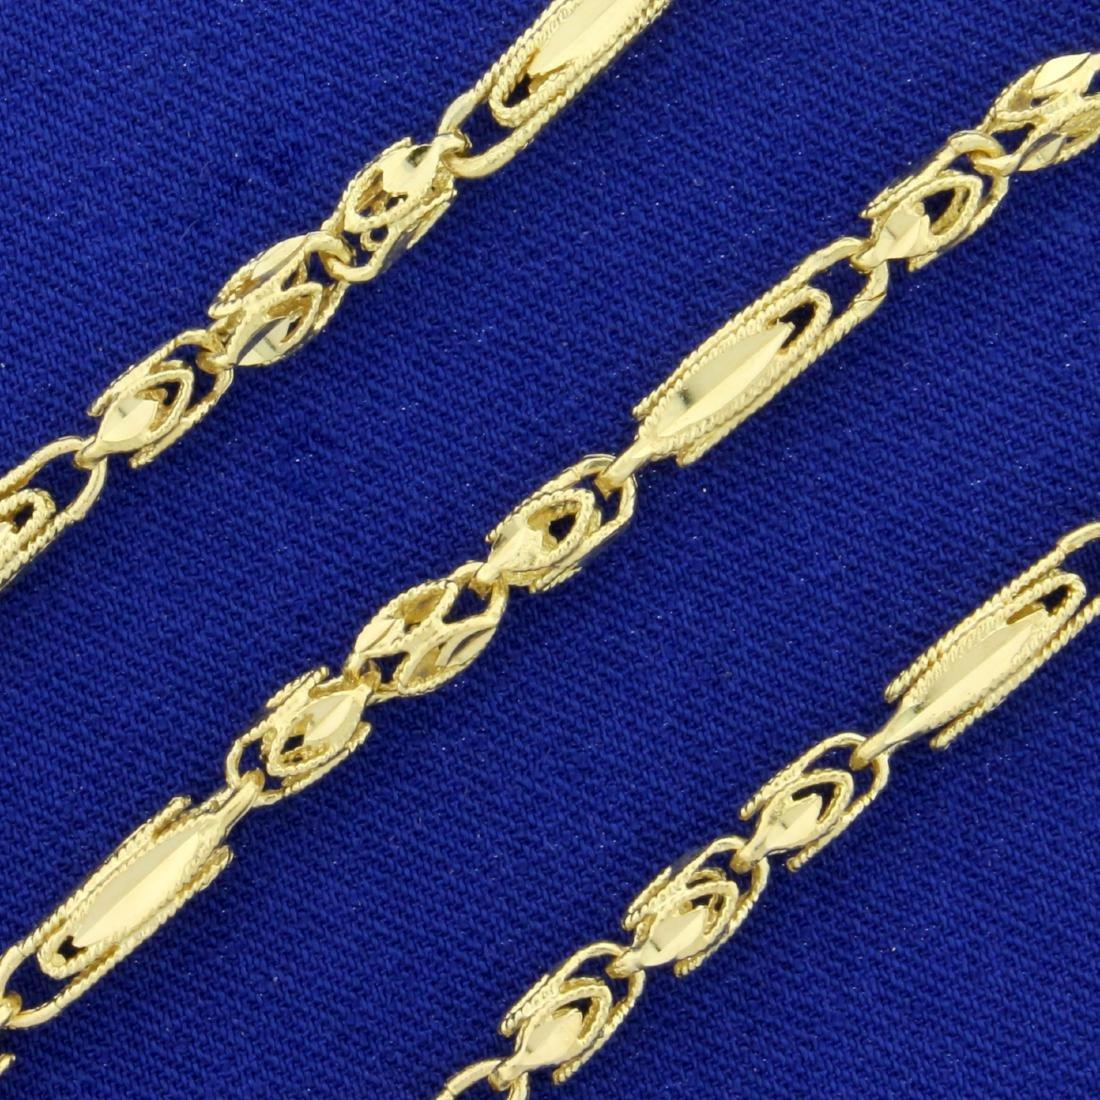 18 Inch Diamond Cut Designer Link Necklace in 14K - 2